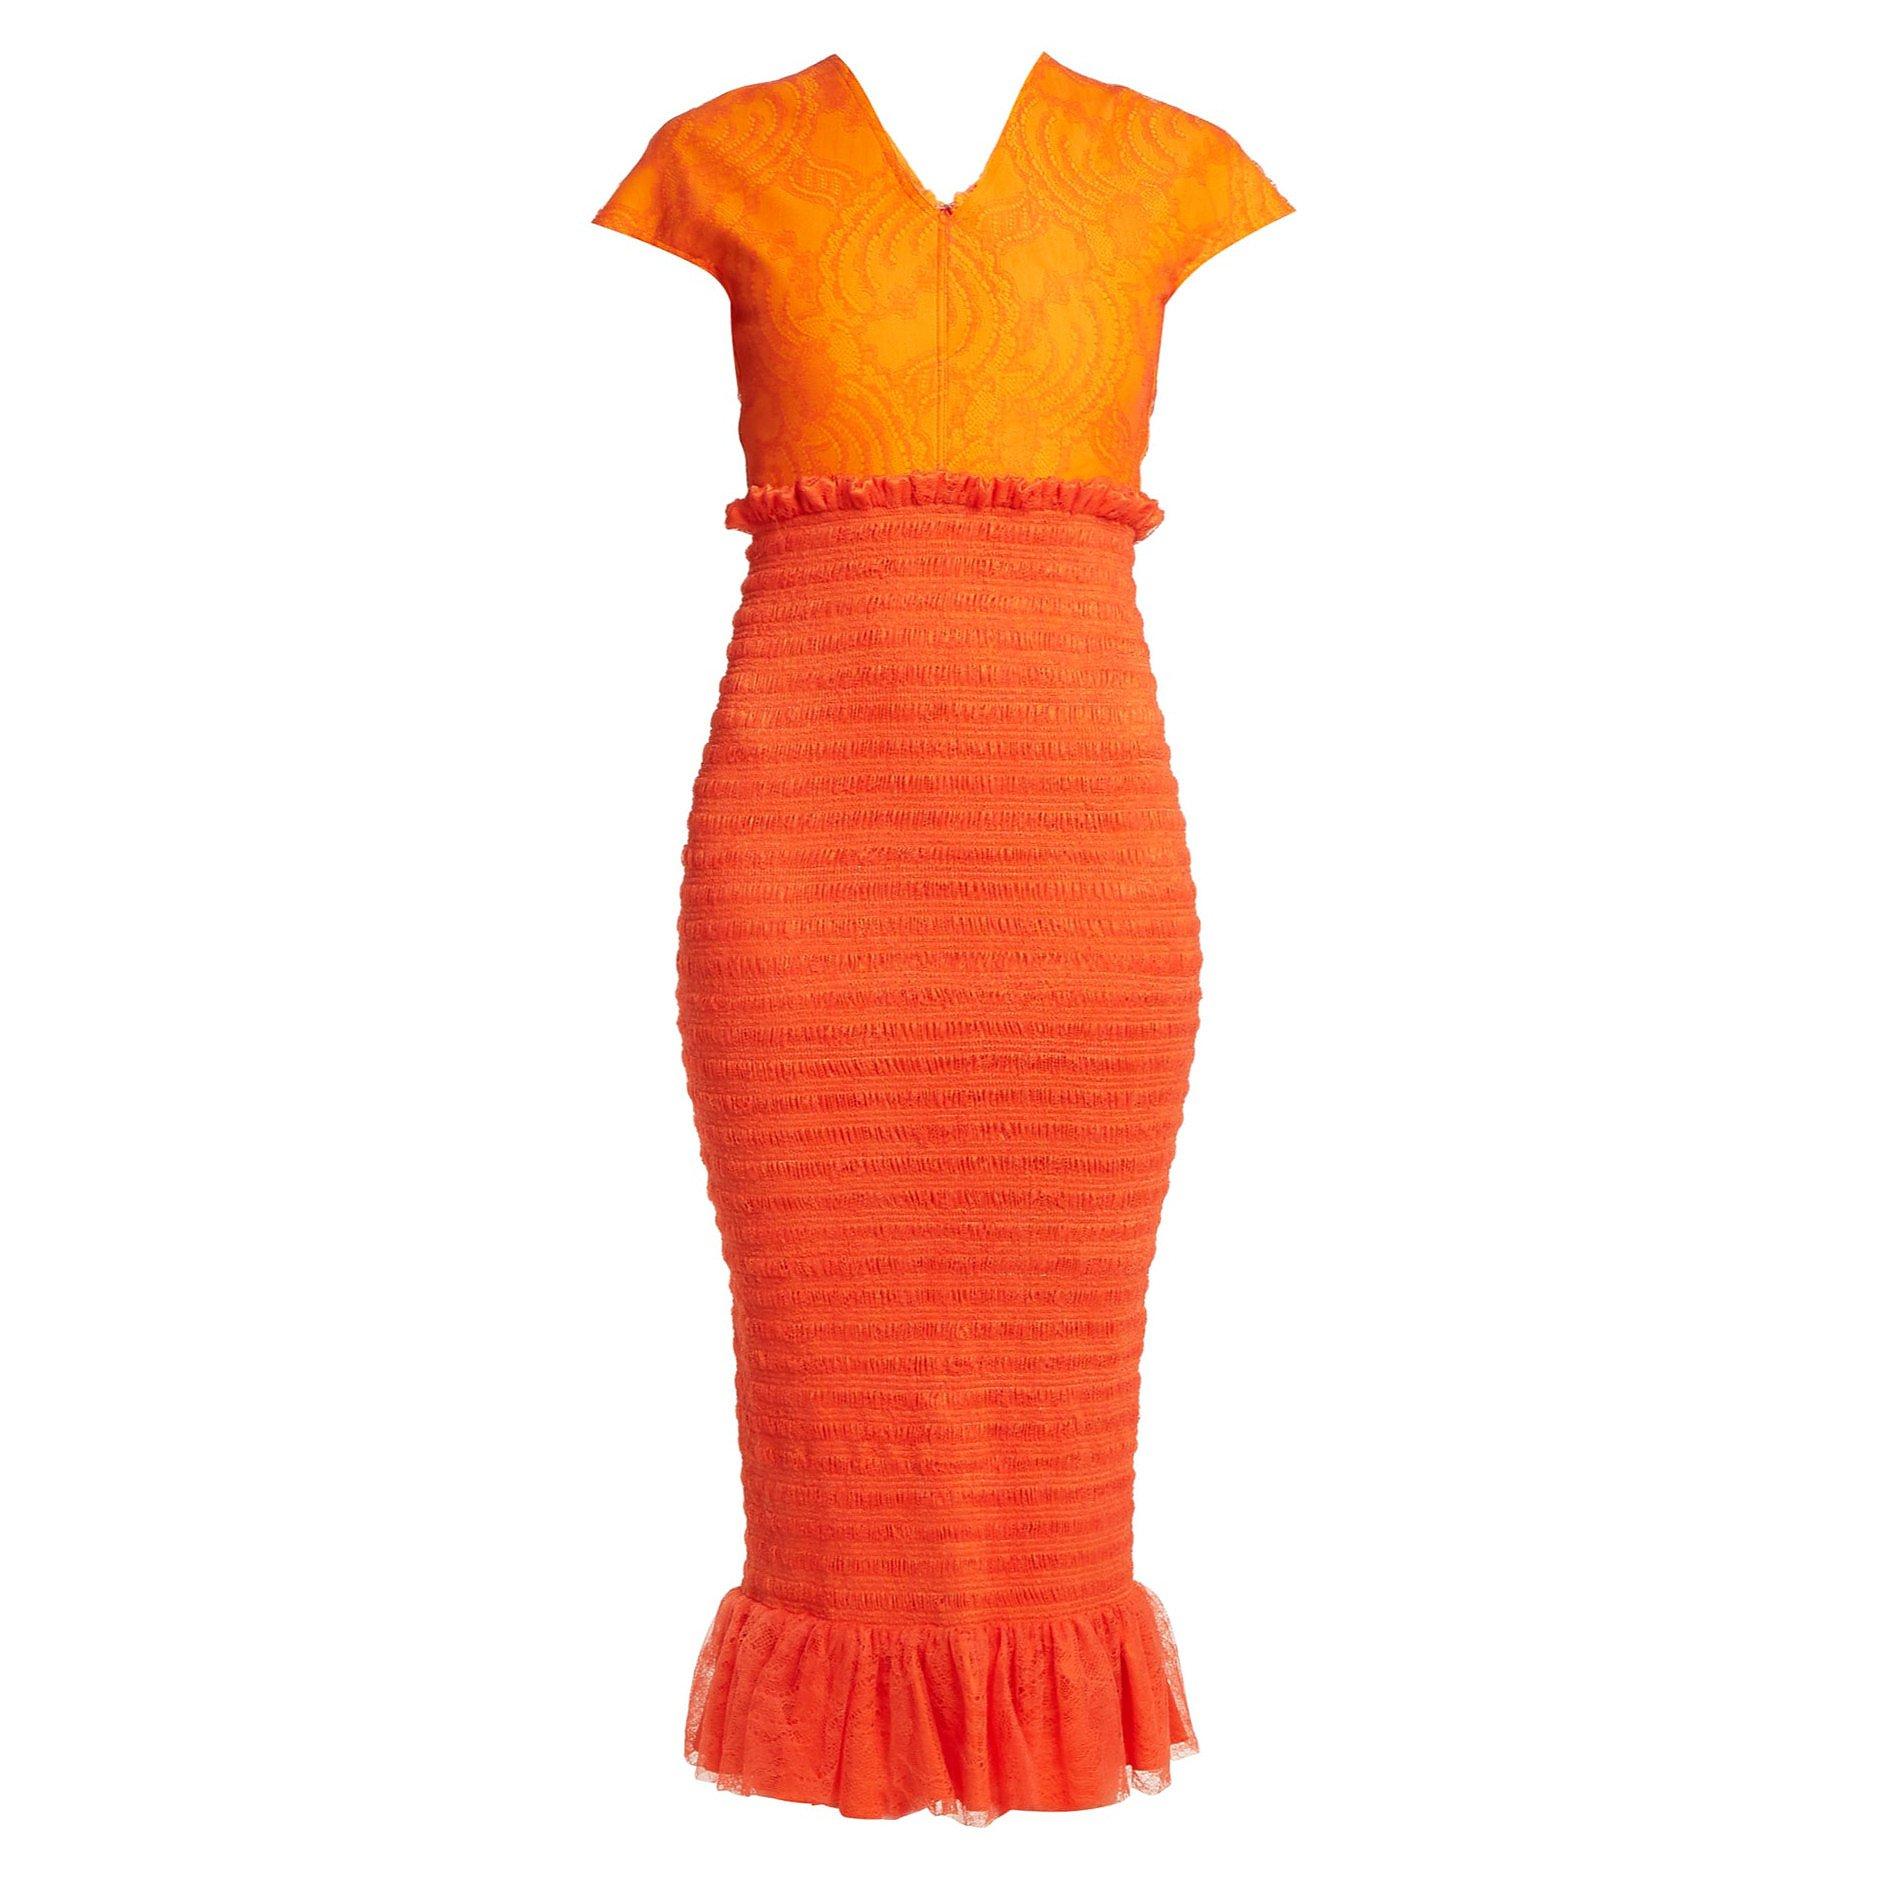 Emilio De La Morena Tamara Shirring & Lace Dress